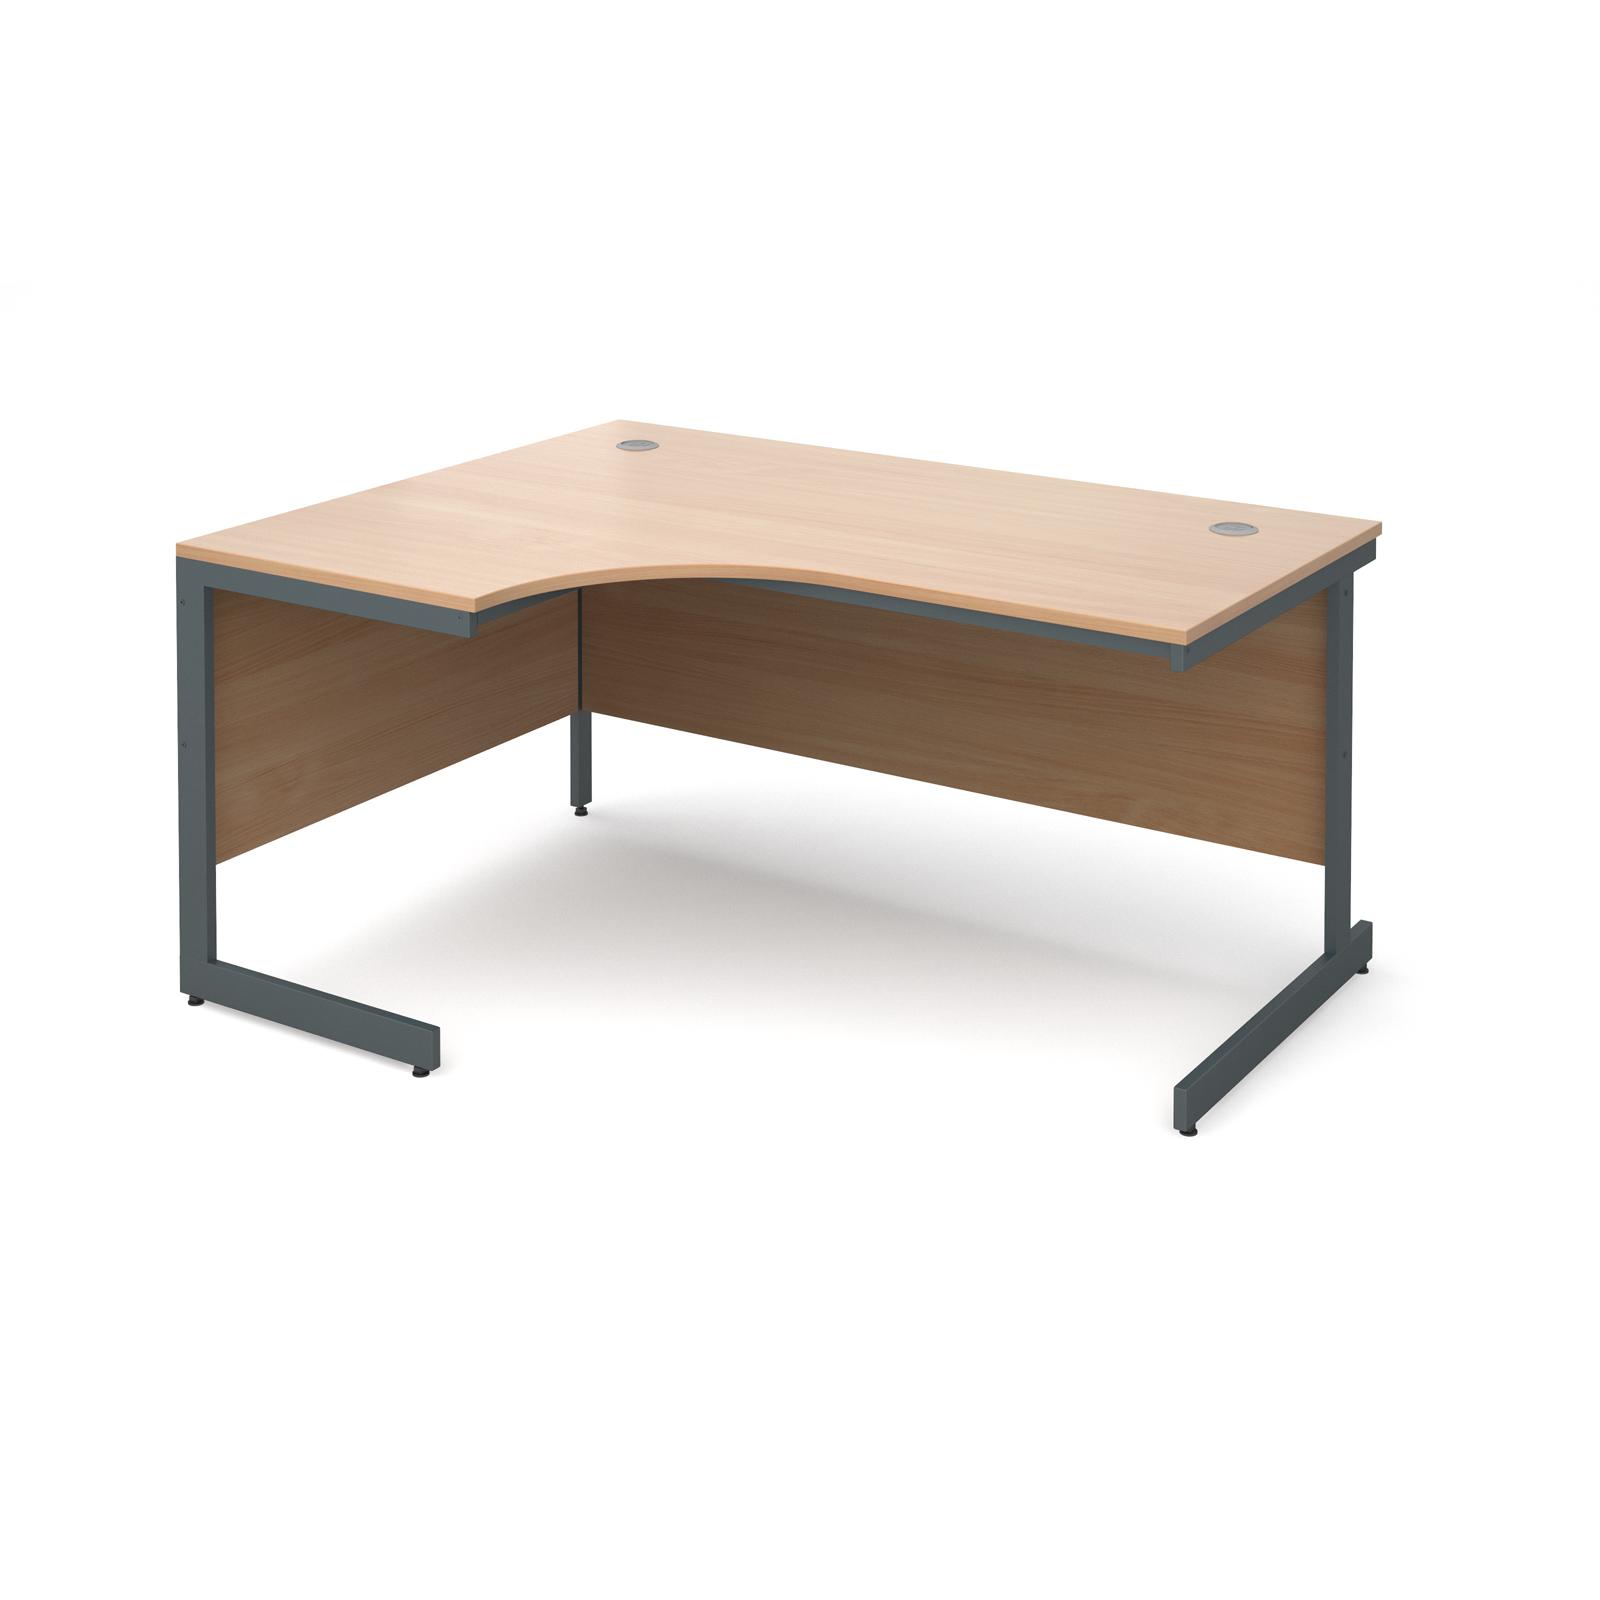 84 Beech Office Furniture Uk Ashford Reception Desk